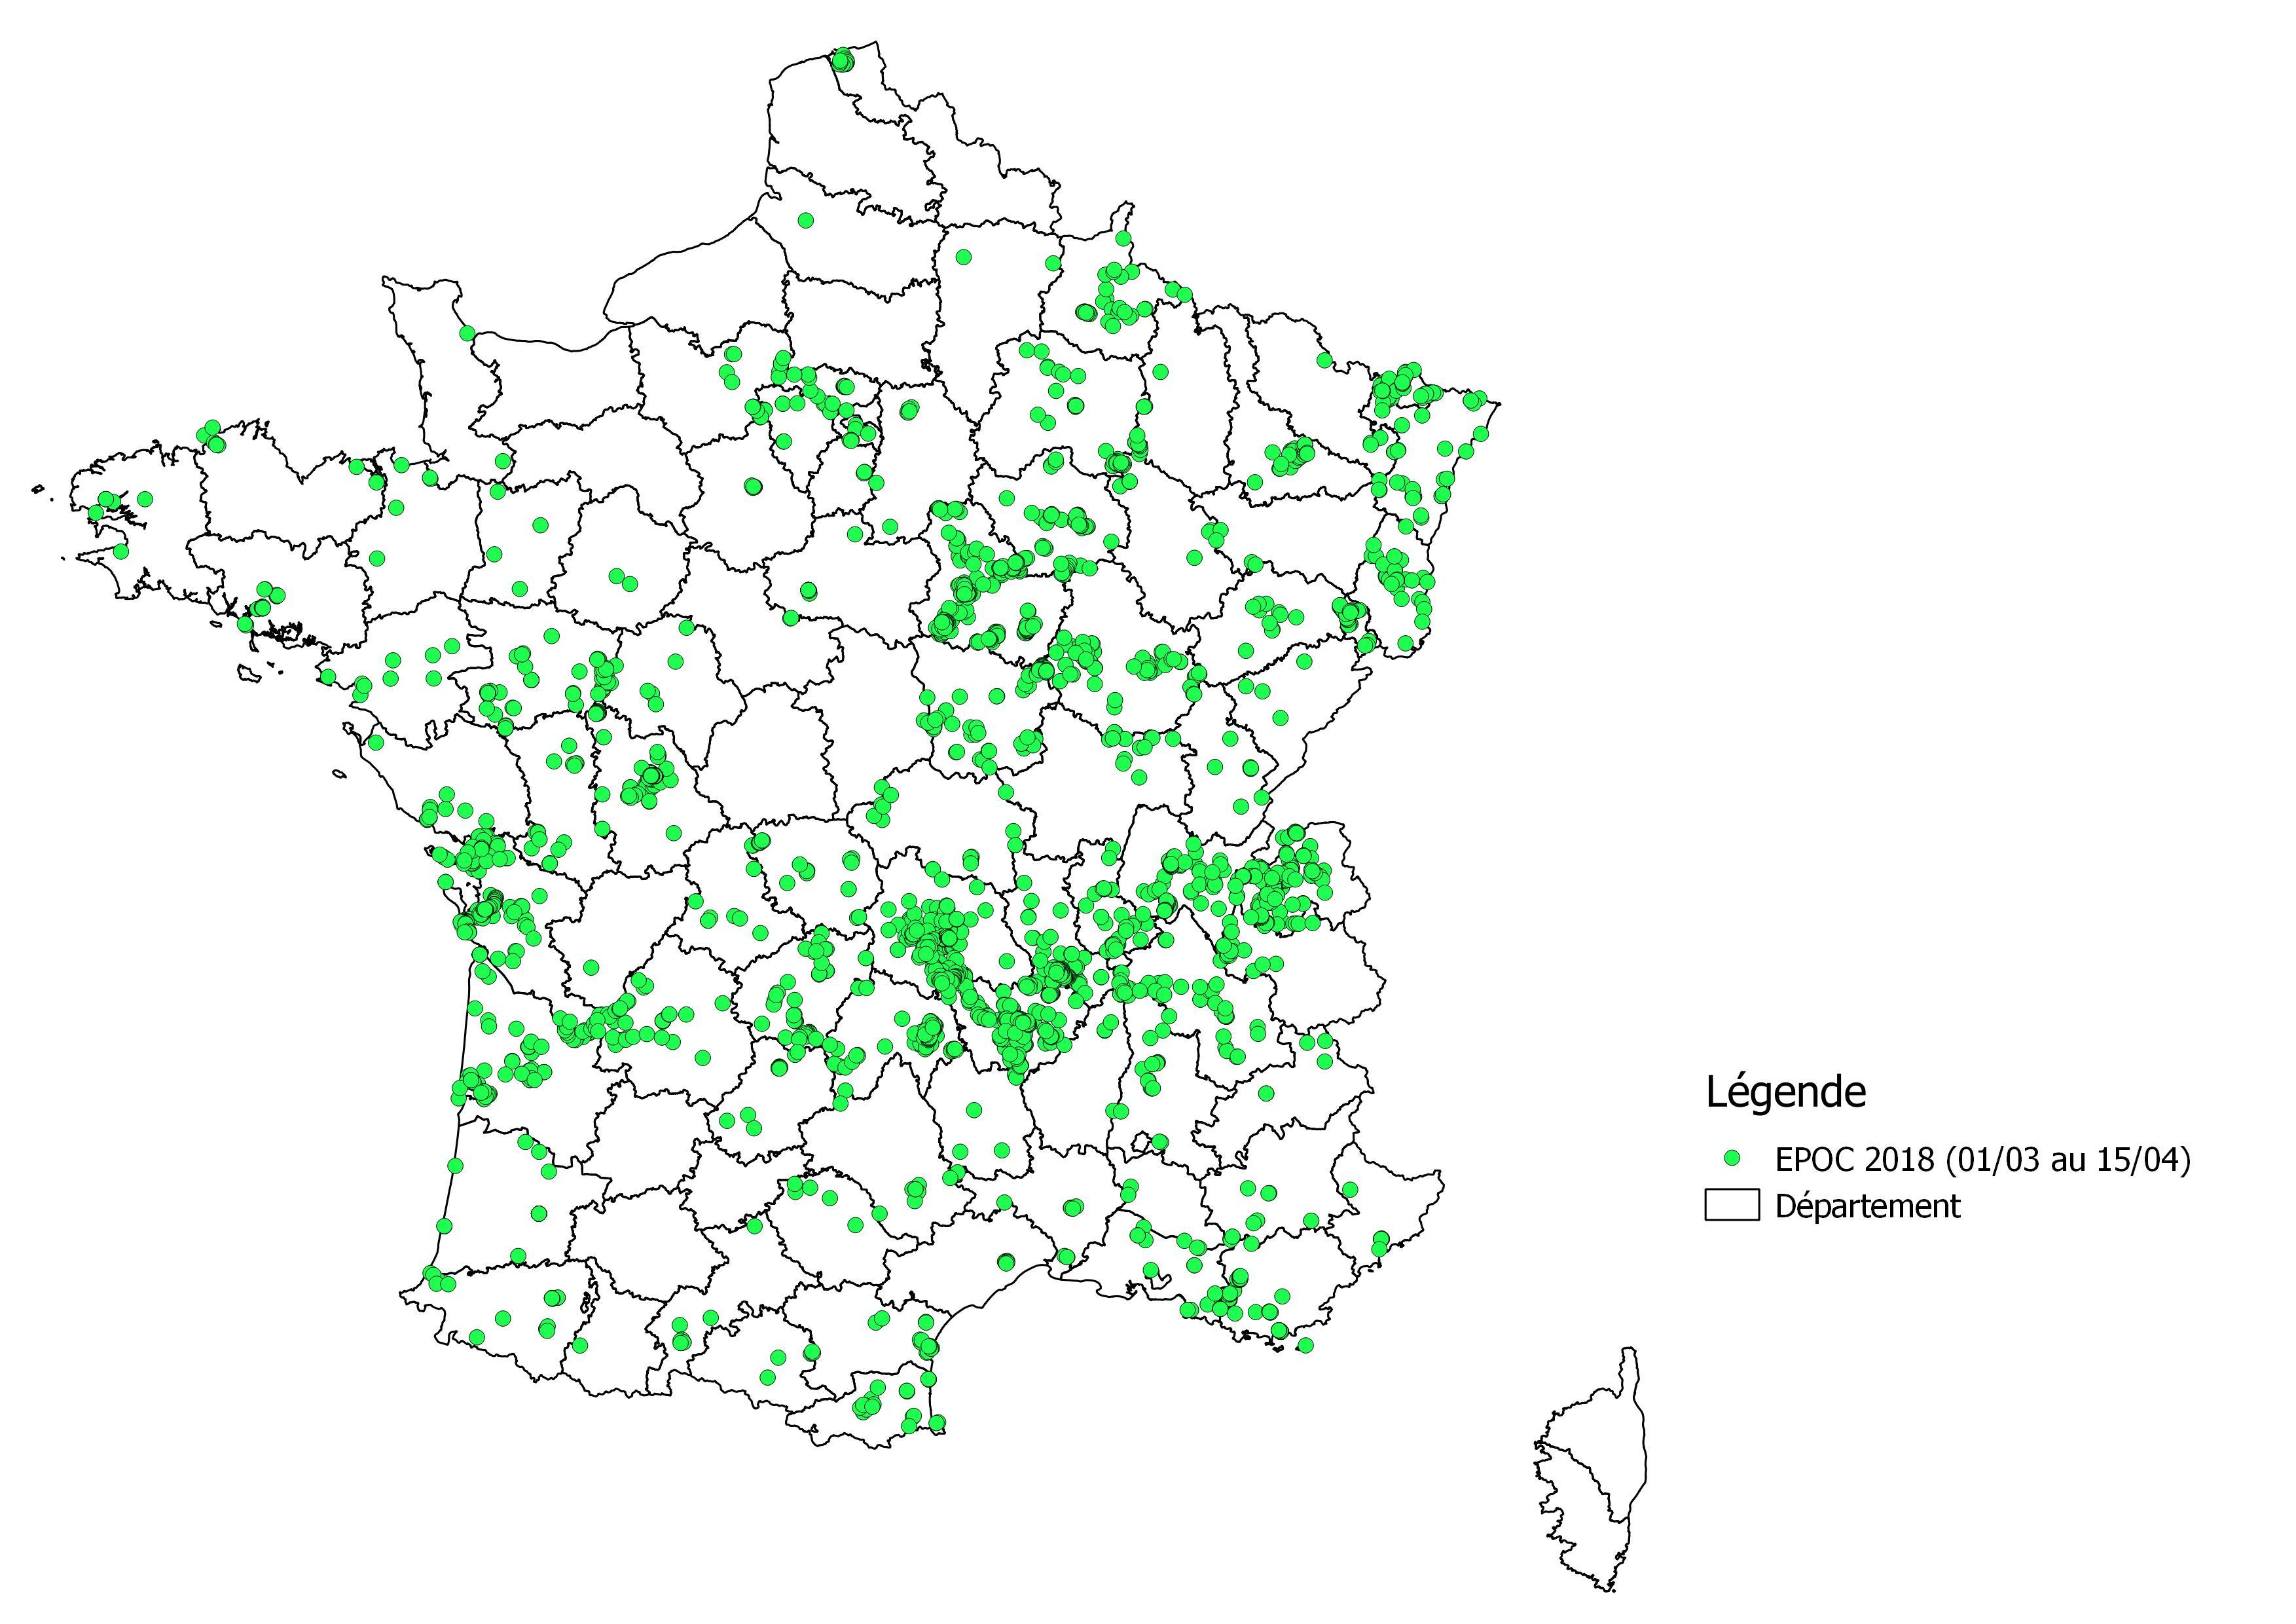 http://files.biolovision.net/www.faune-lorraine.org/userfiles/EPOC/epoc2018.jpeg